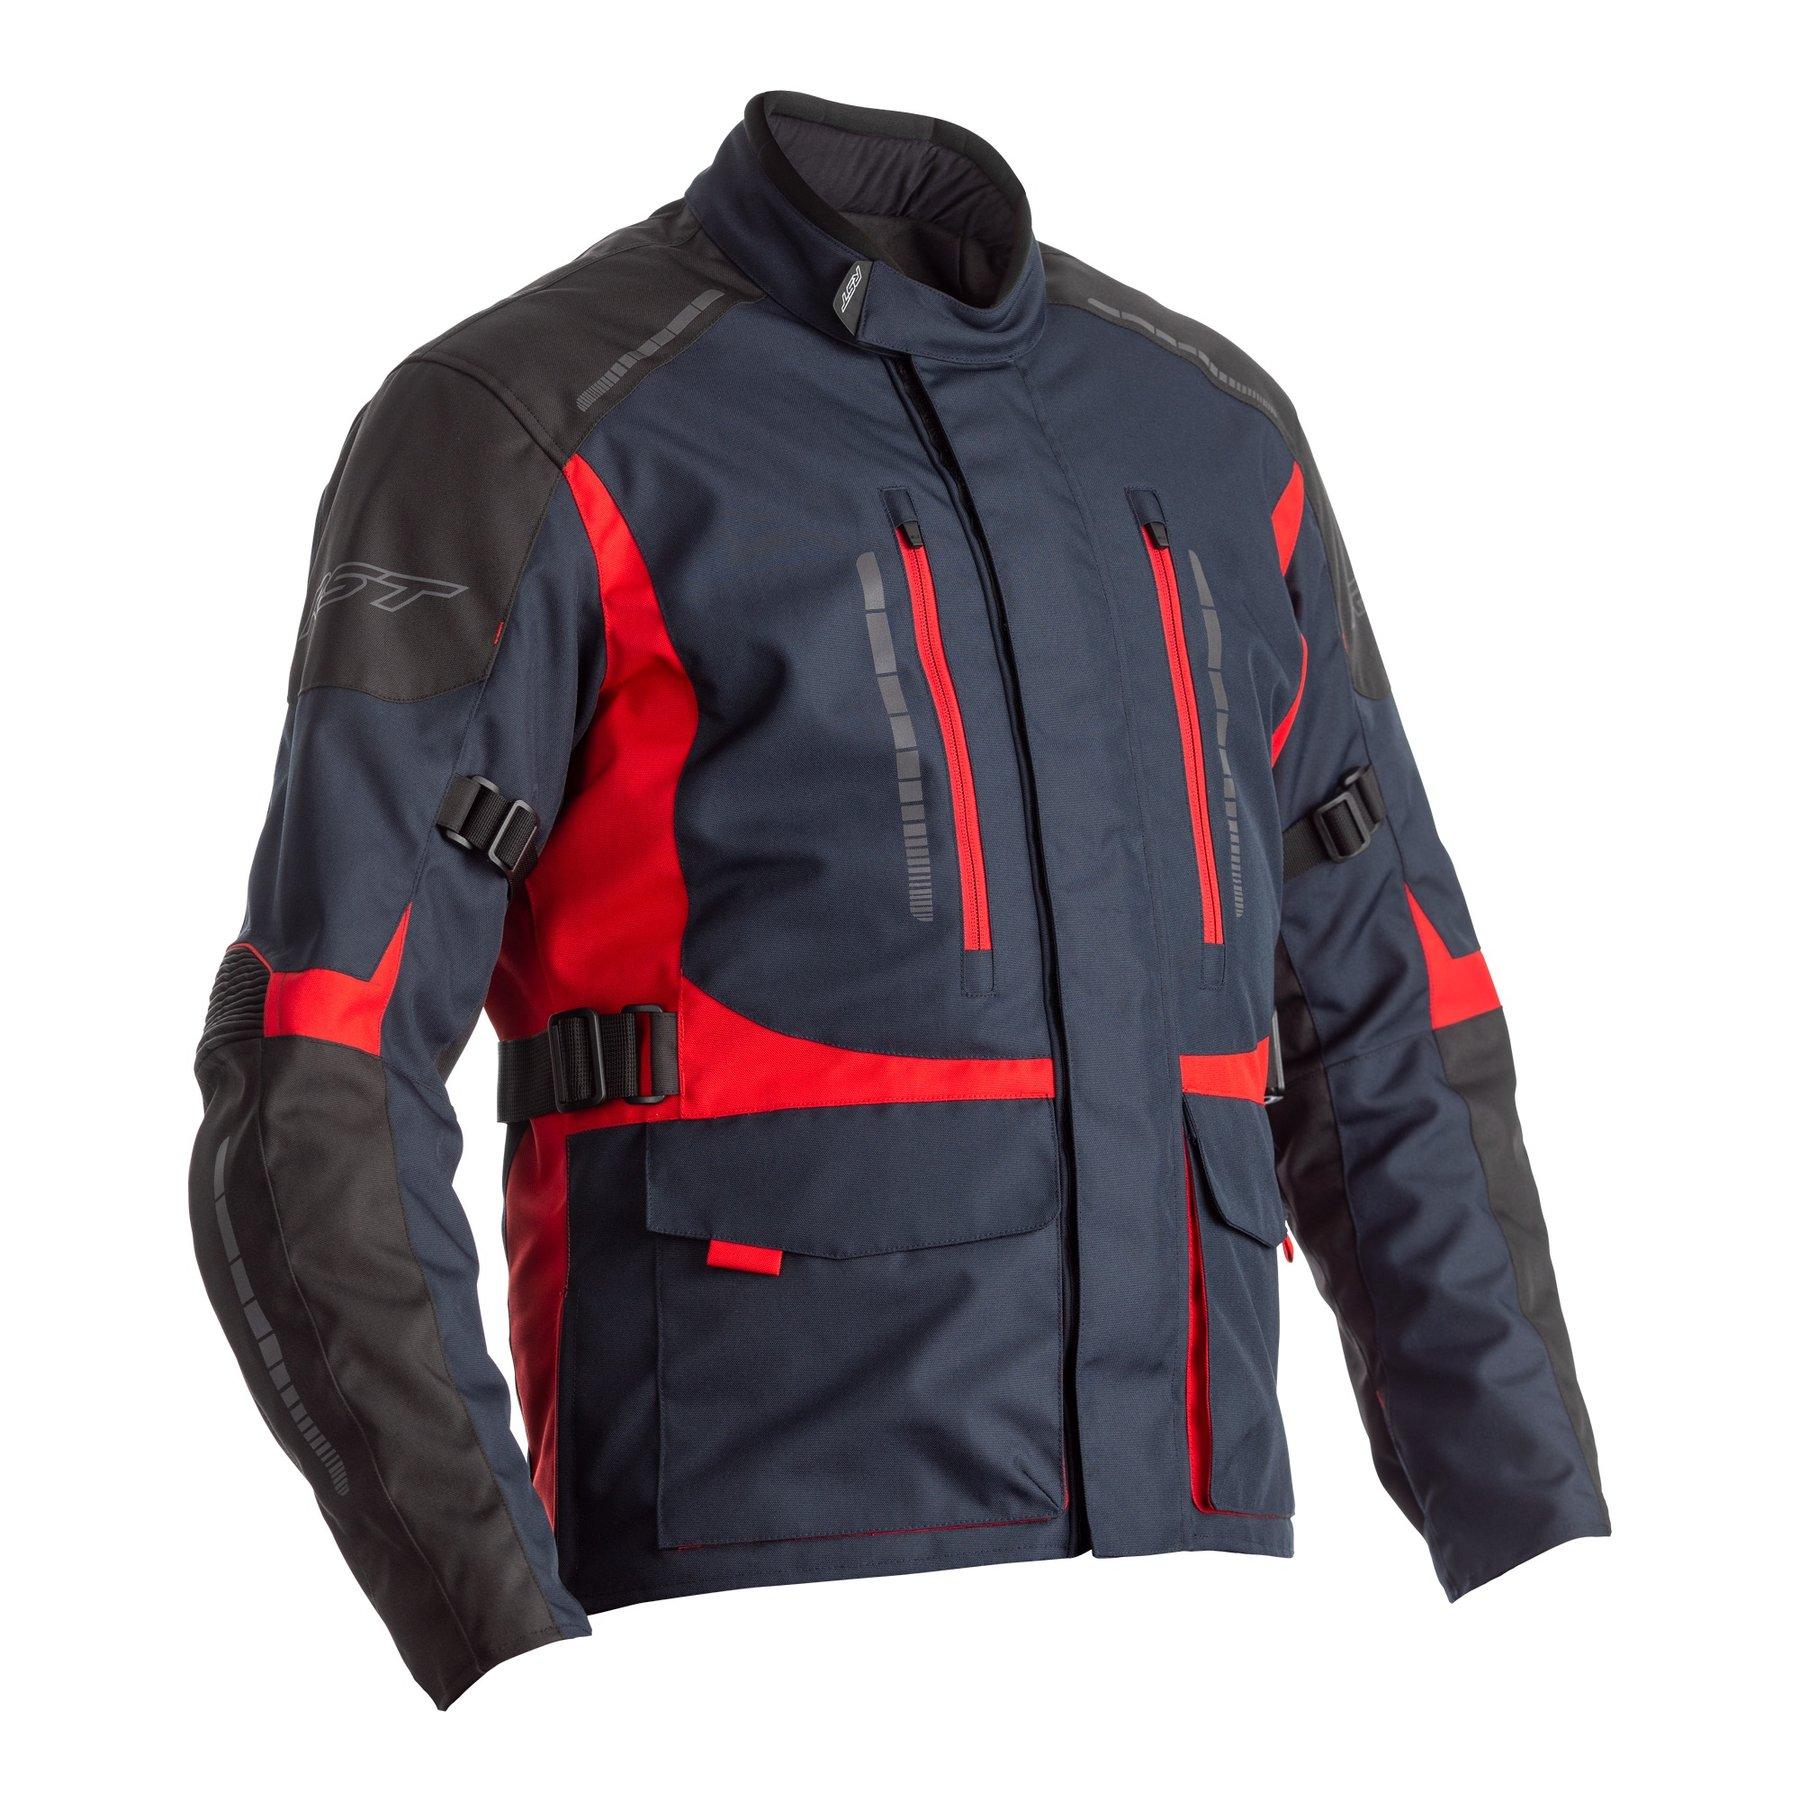 RST Atlas Jacket